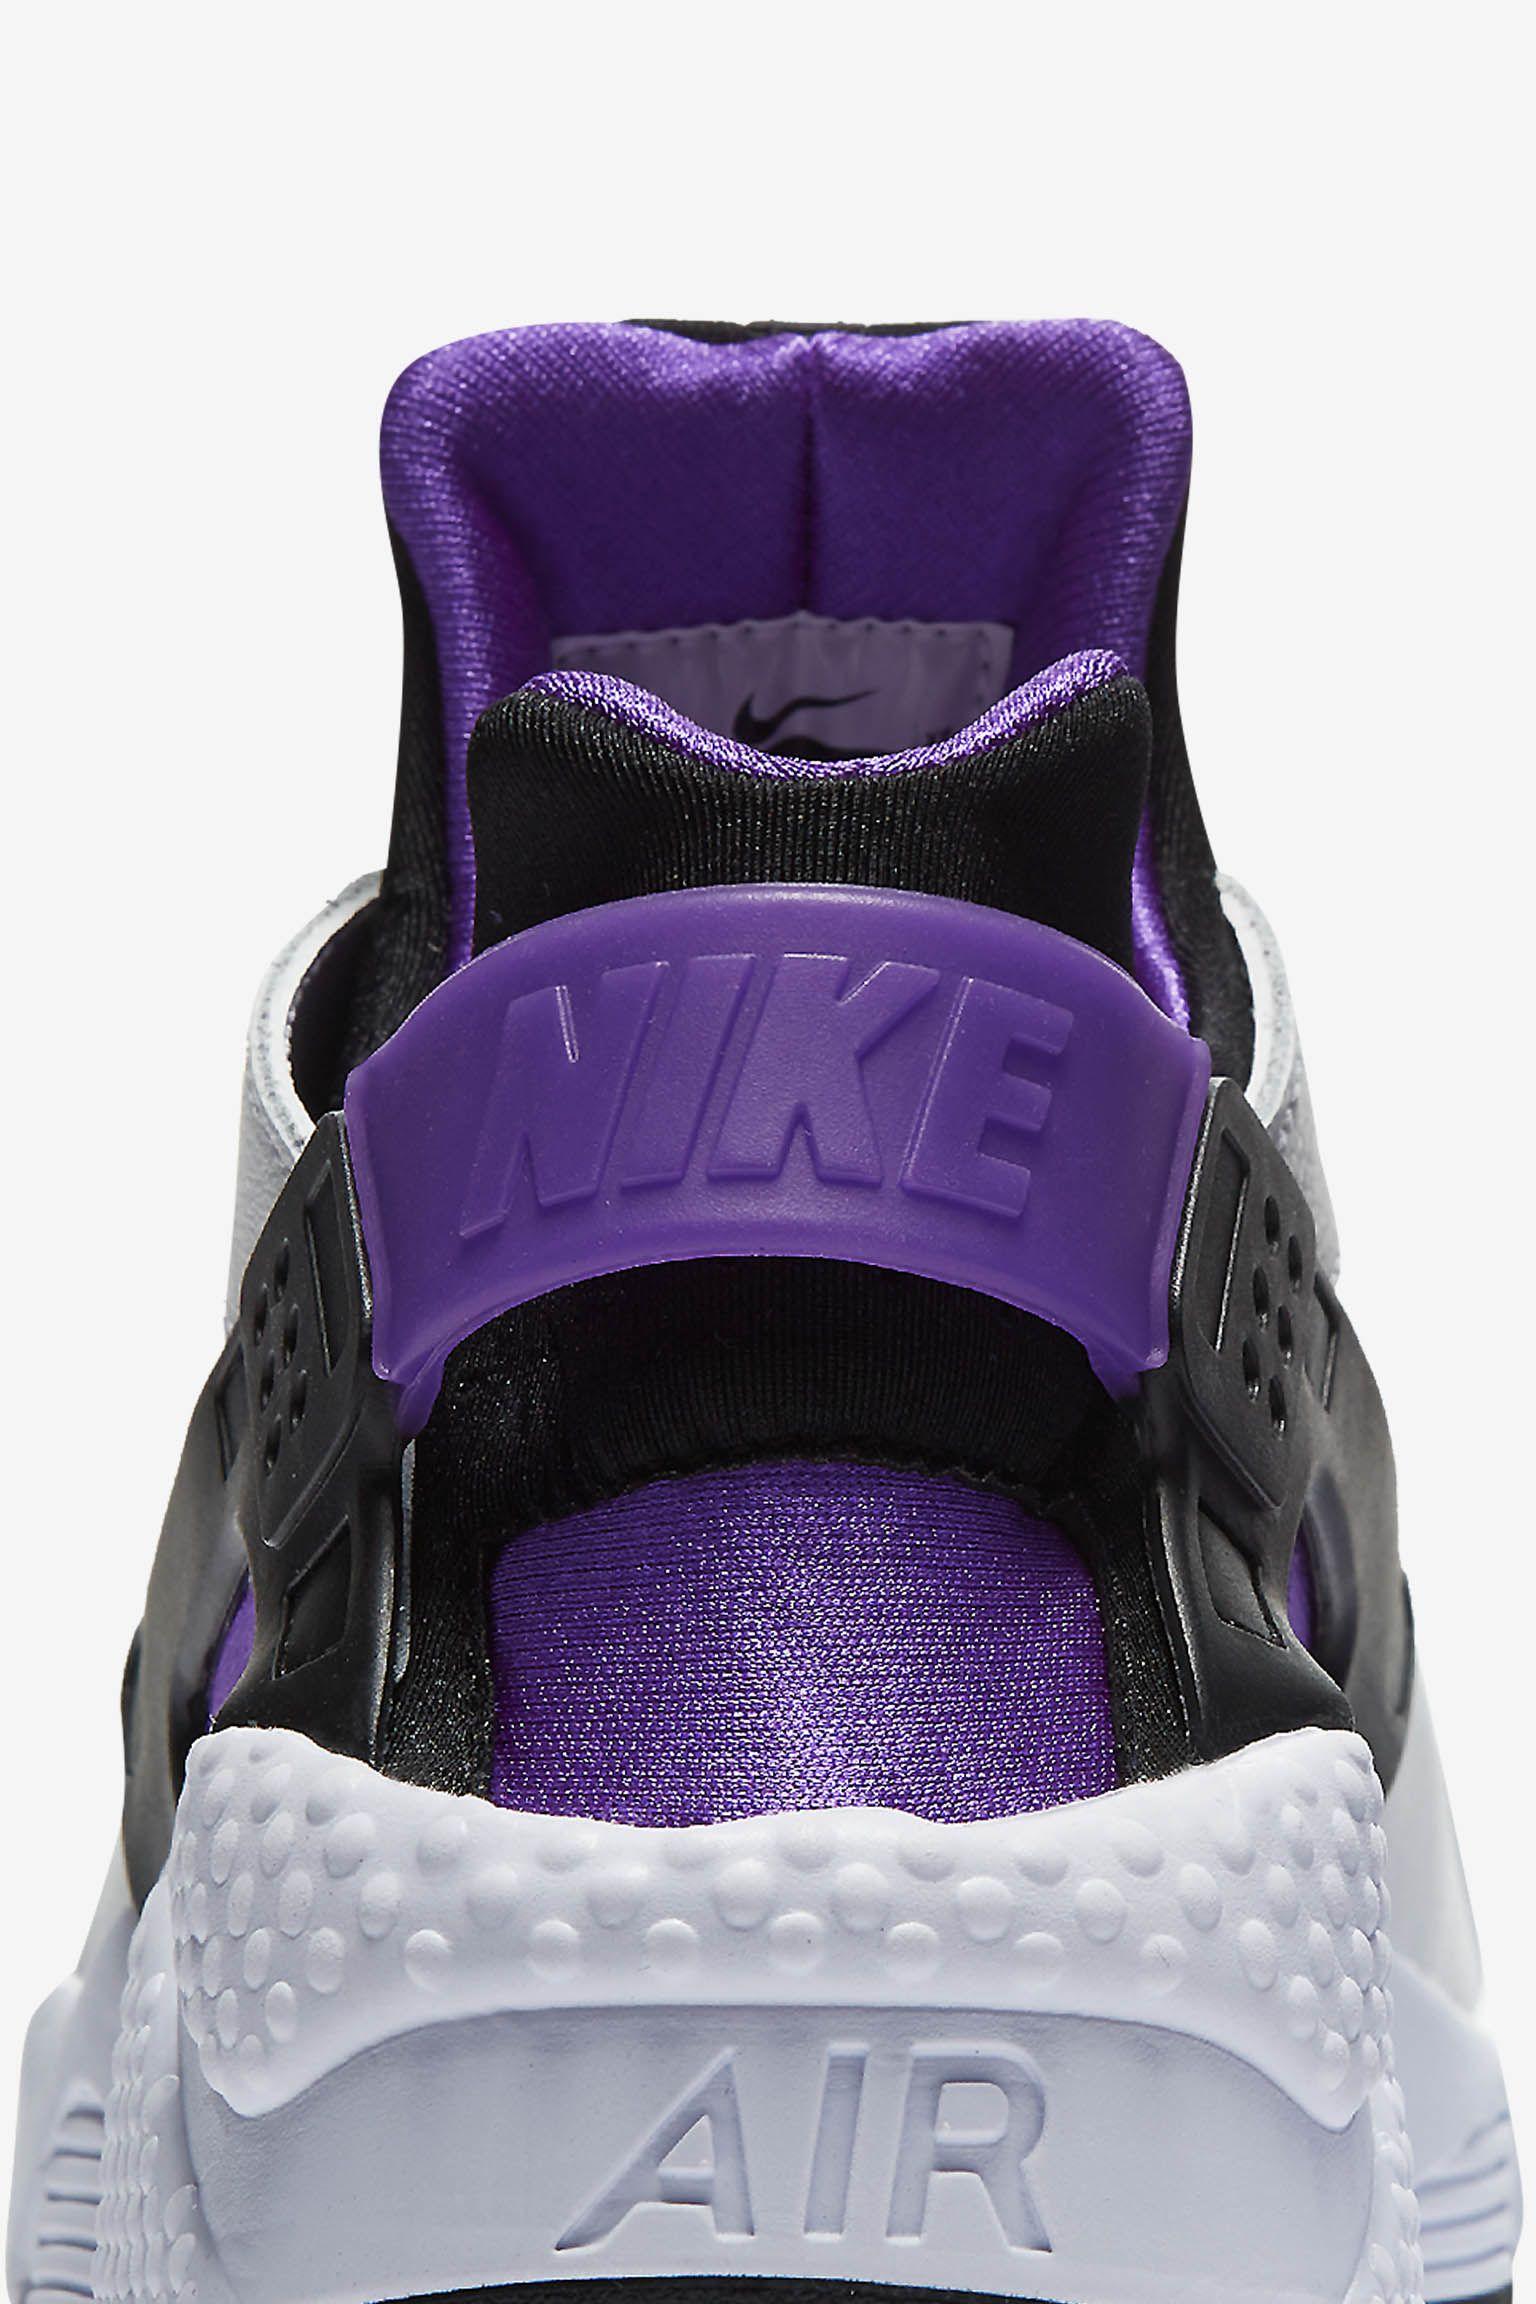 Nike Air Huarache Run '91 'White & Purple Punch' Release Date